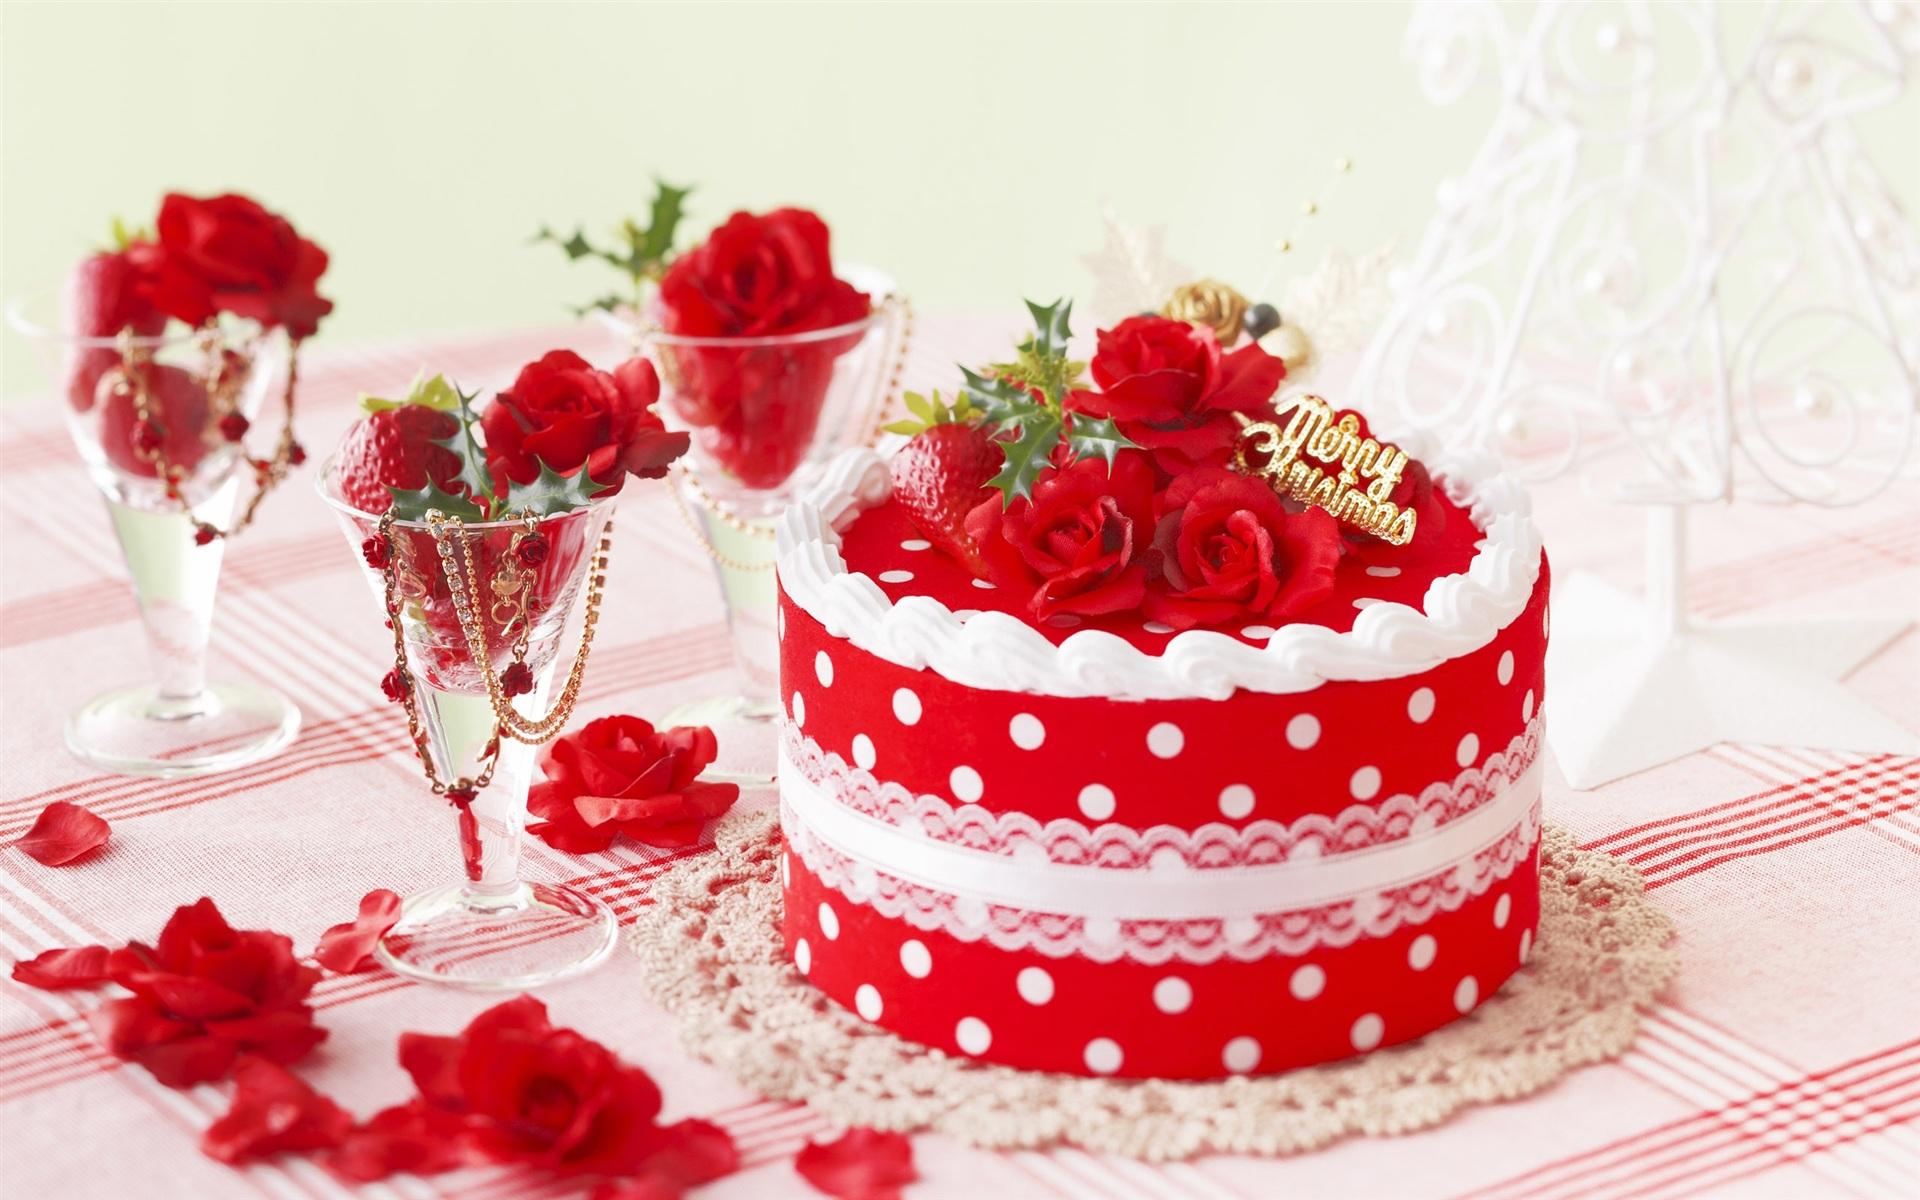 http://ru.best-wallpaper.net/wallpaper/1920x1200/1109/Festive-cake_1920x1200.jpg